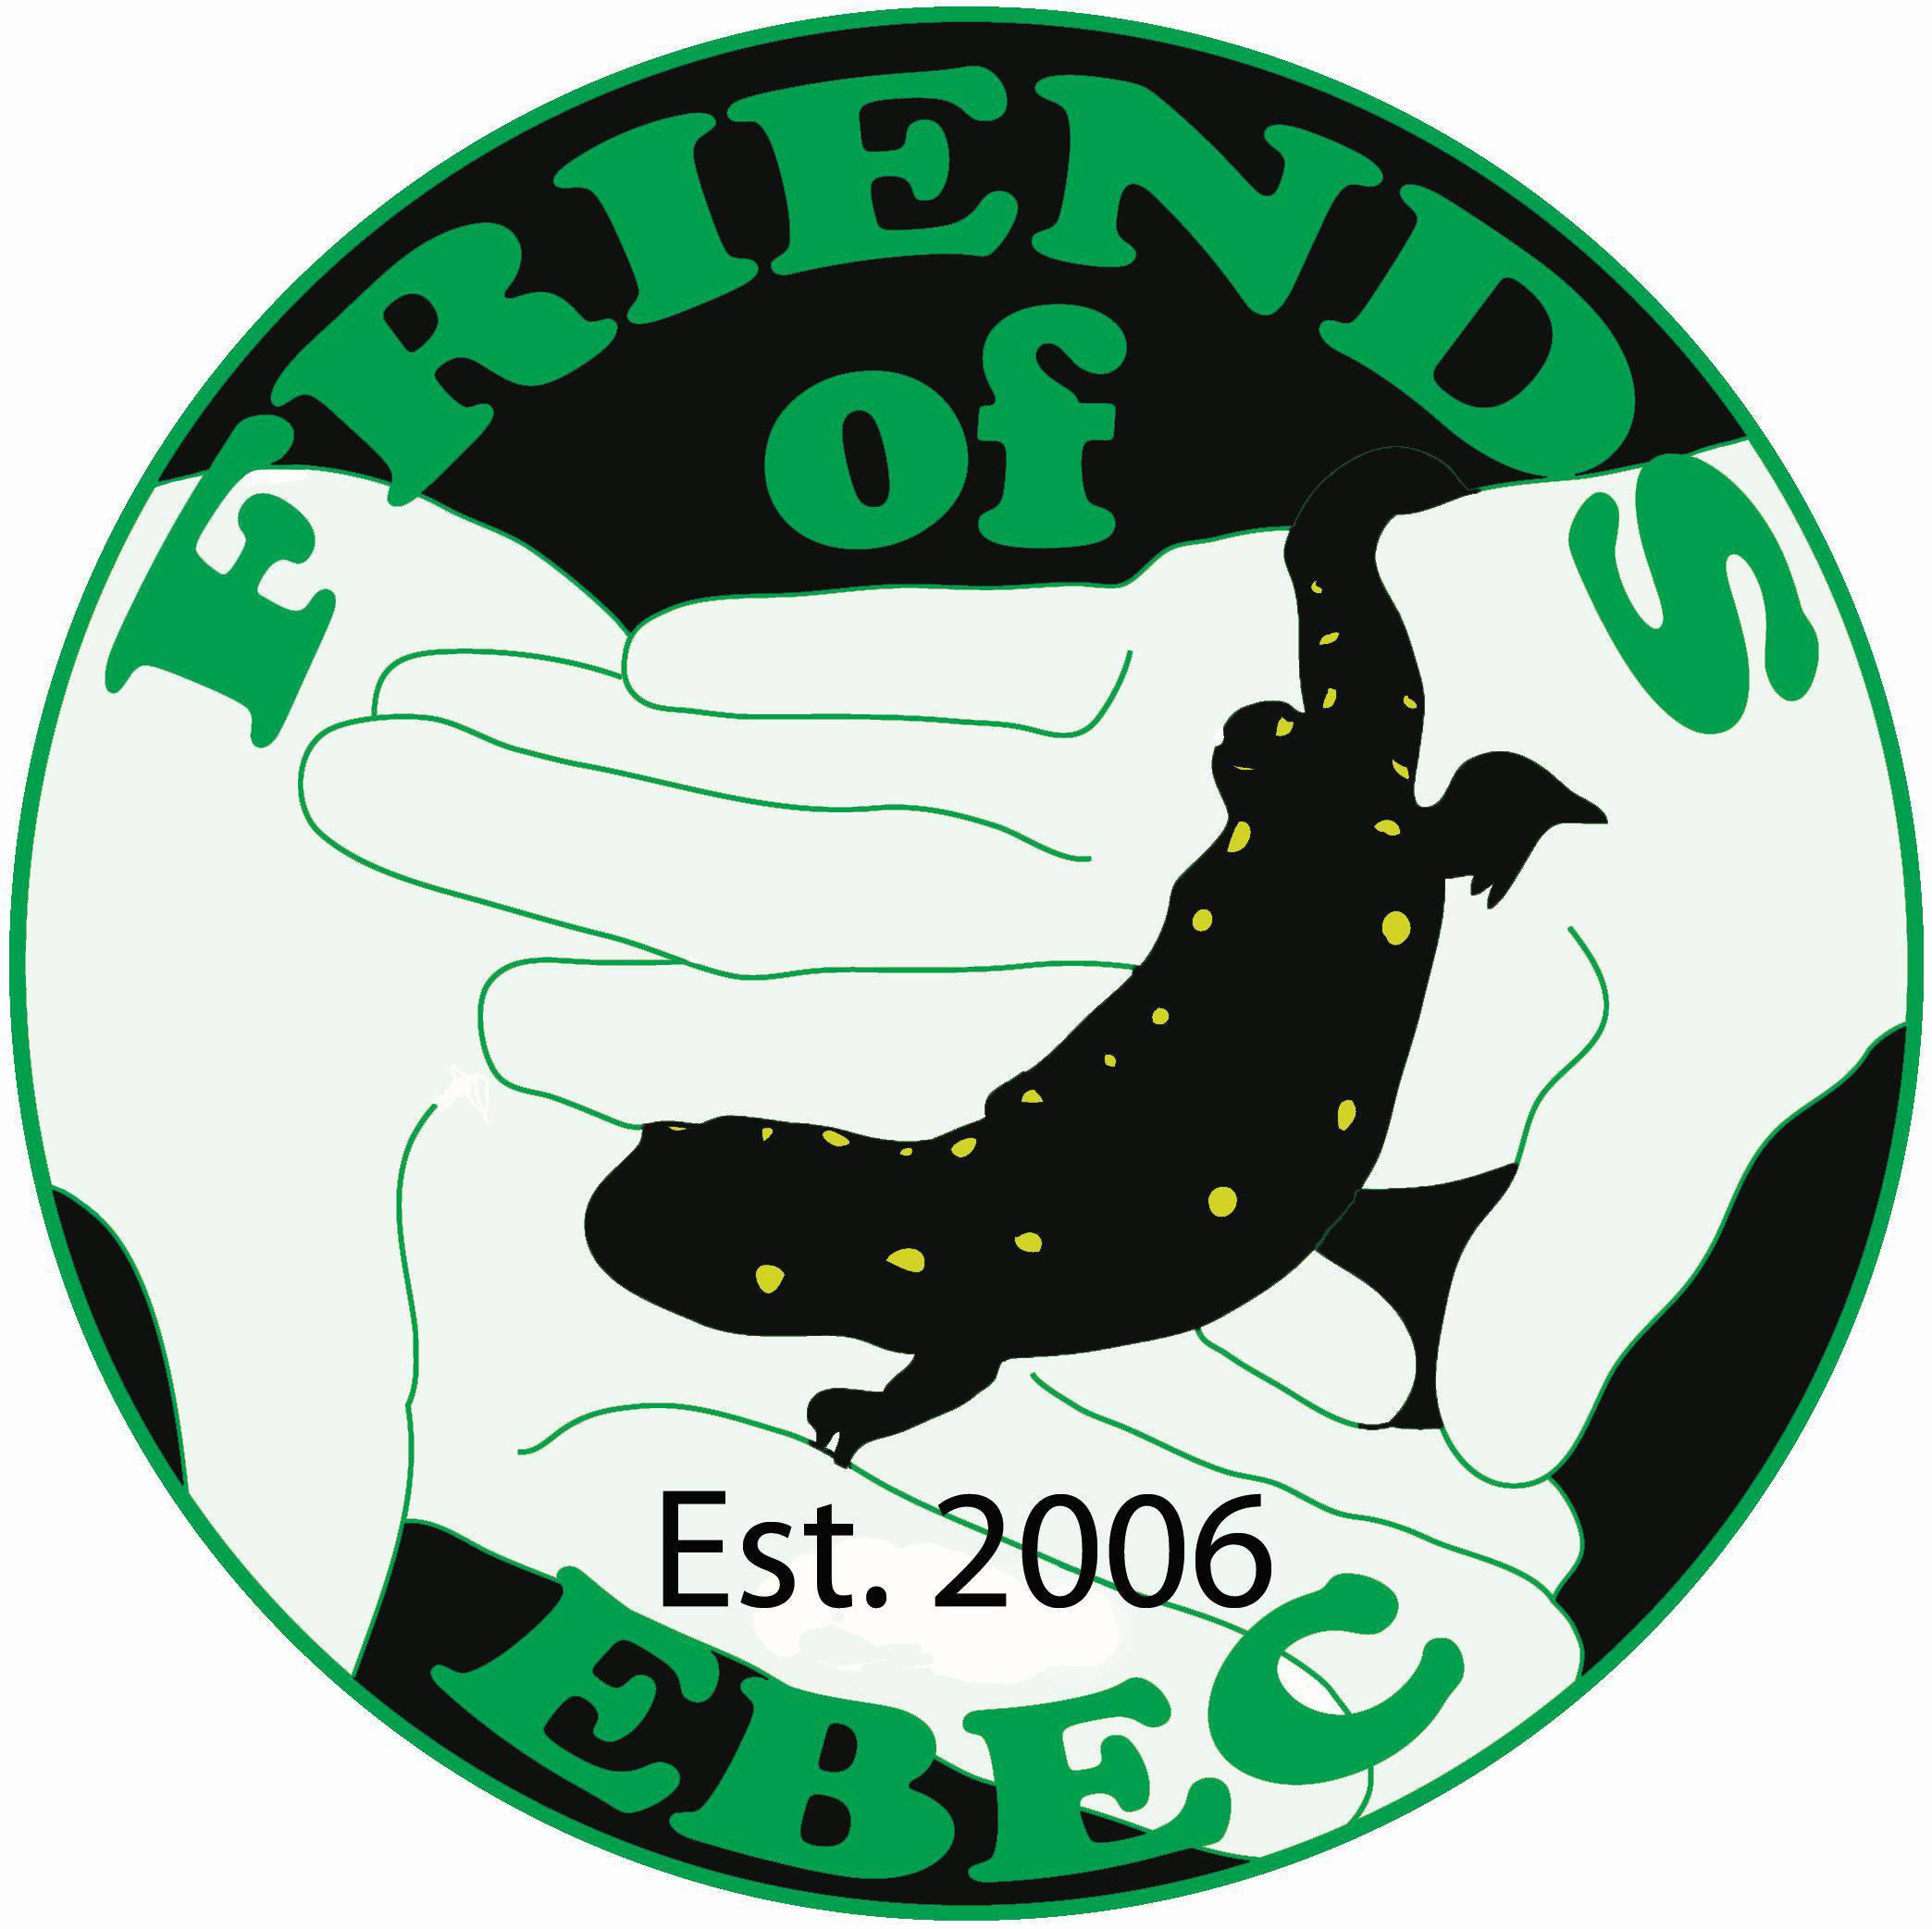 188ae28475b38a74dae3_FriendsLogo1.jpg